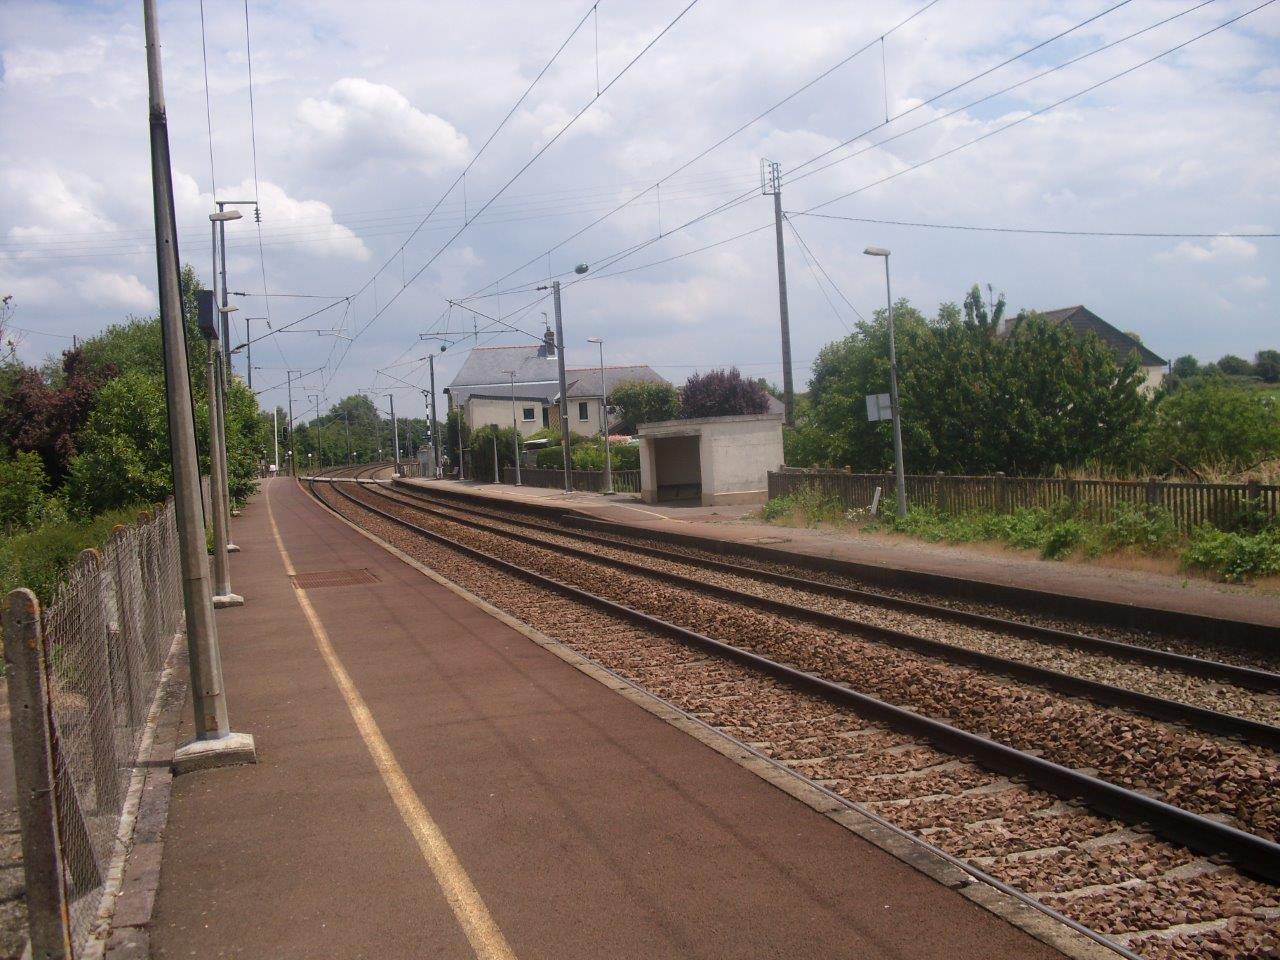 gare-de-servon-train-station